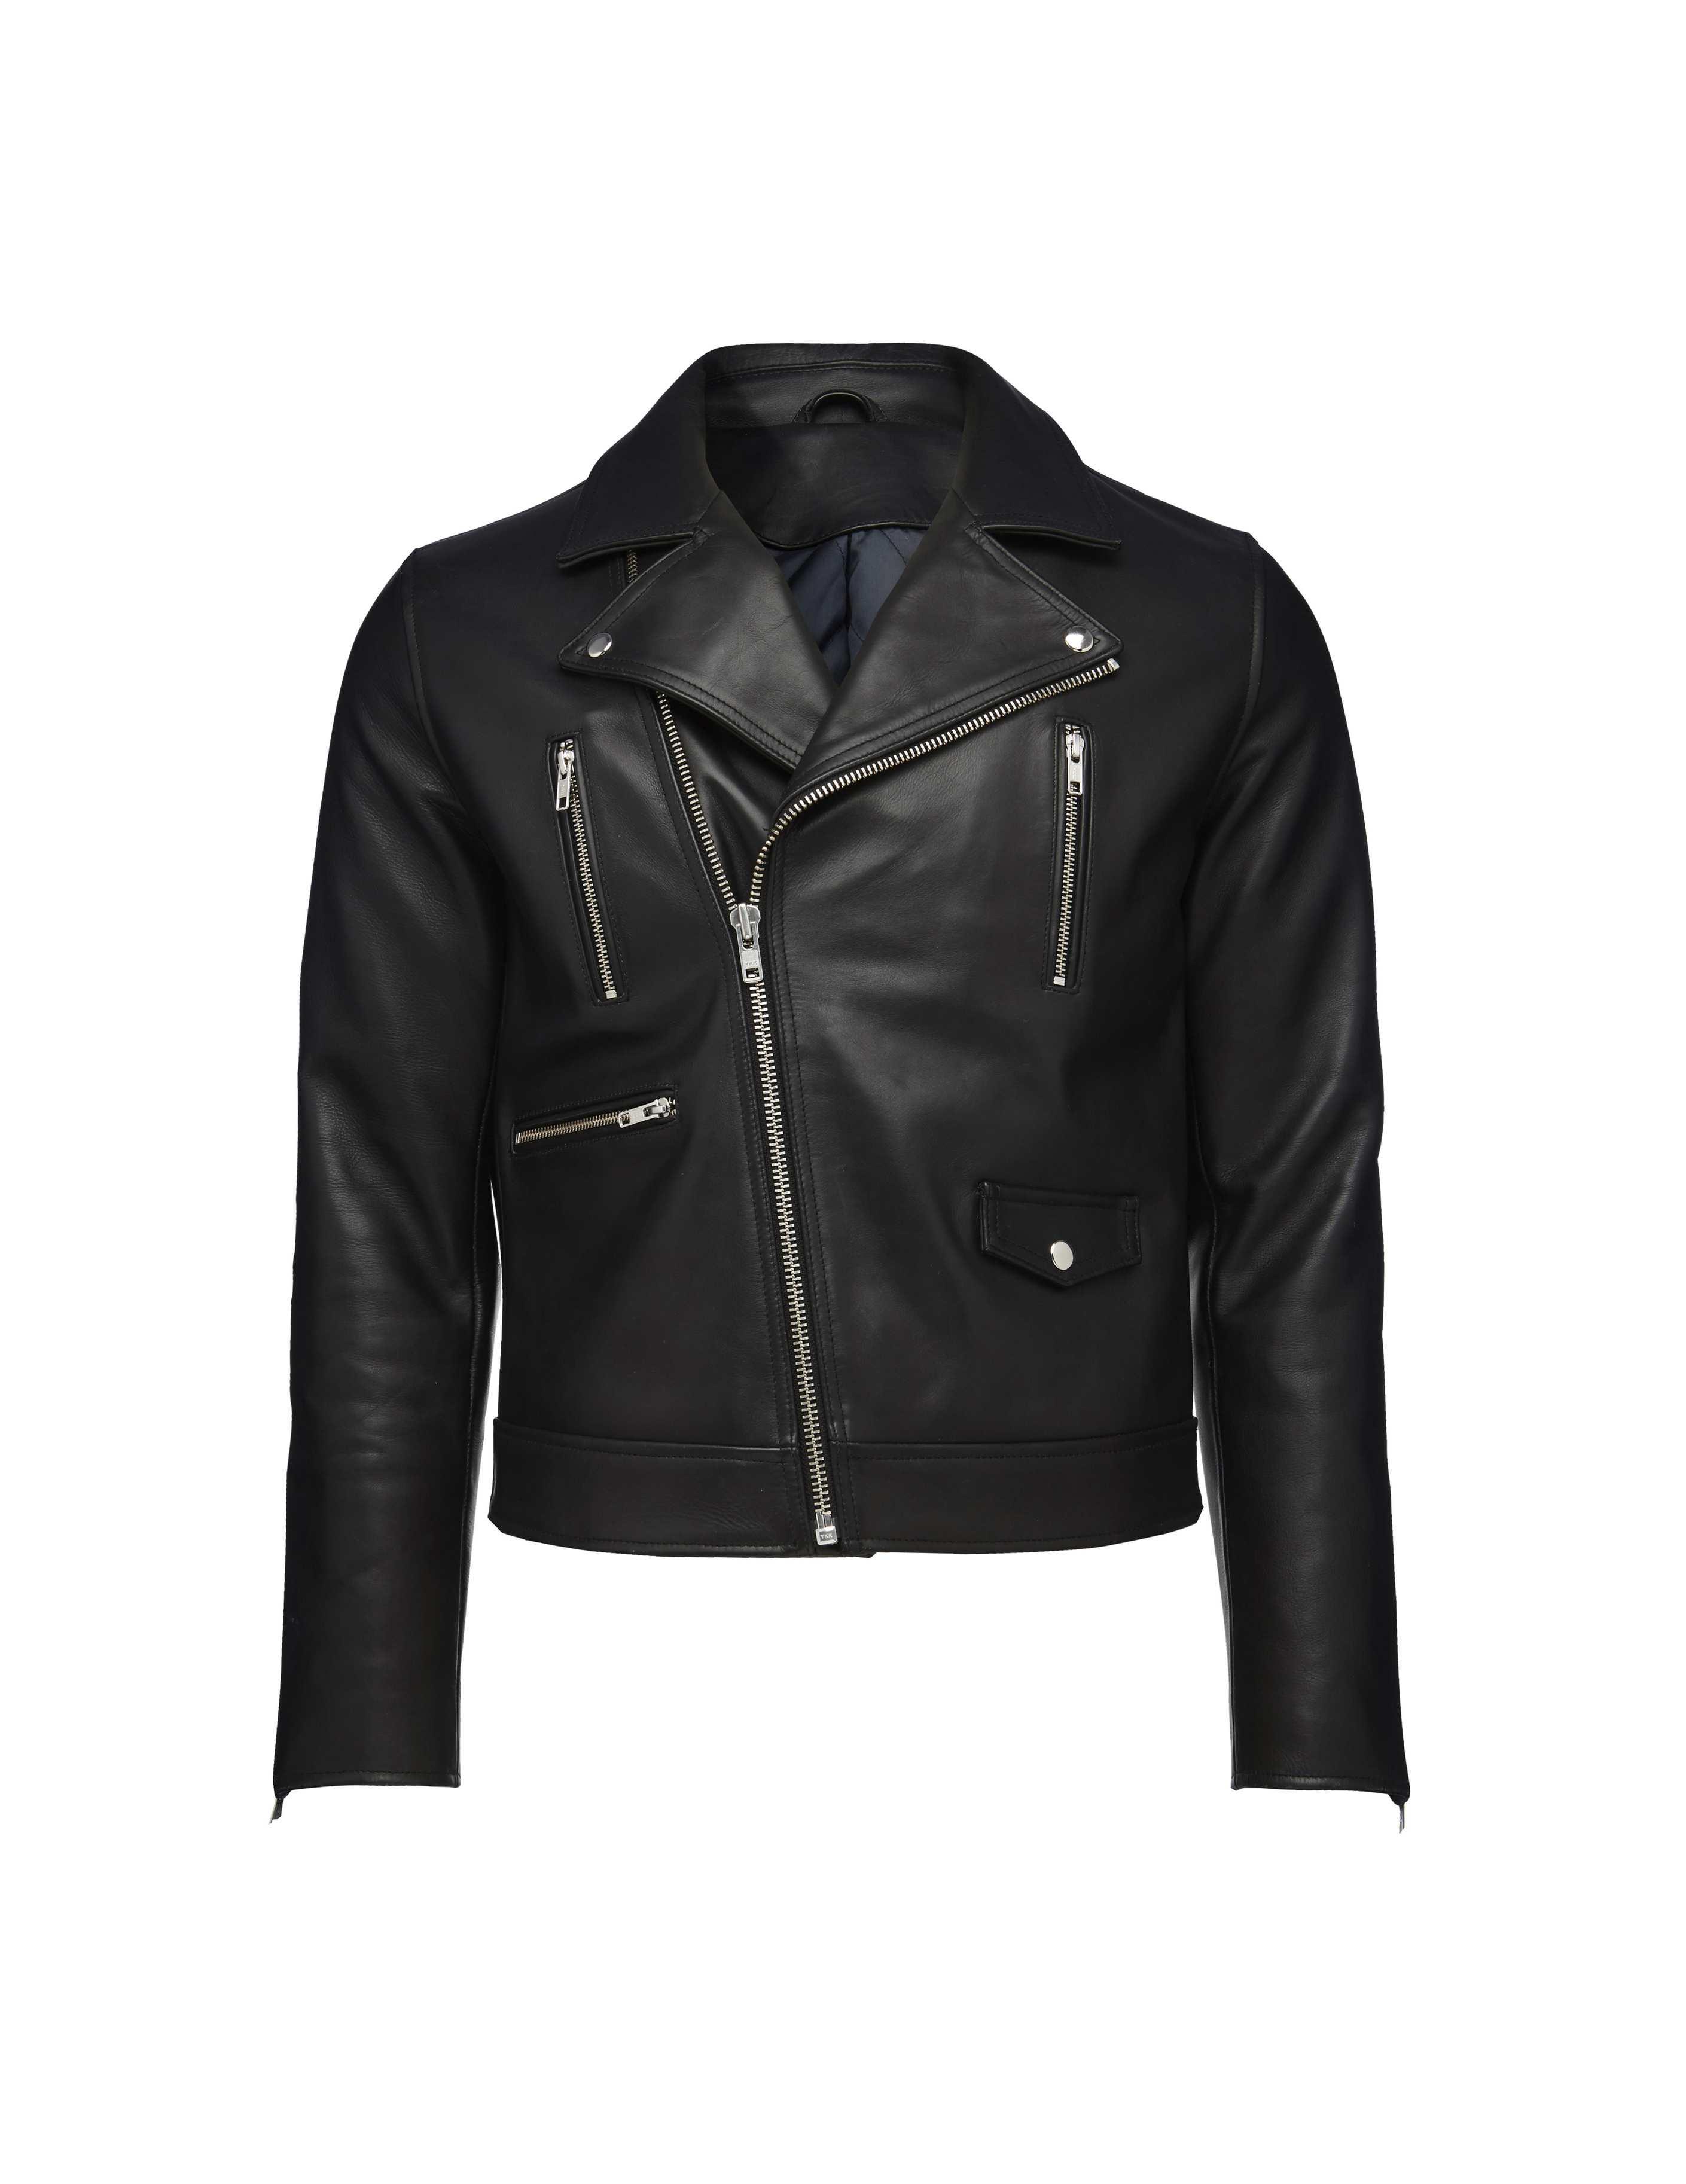 Fygare leather jacket Köp All Clothing online